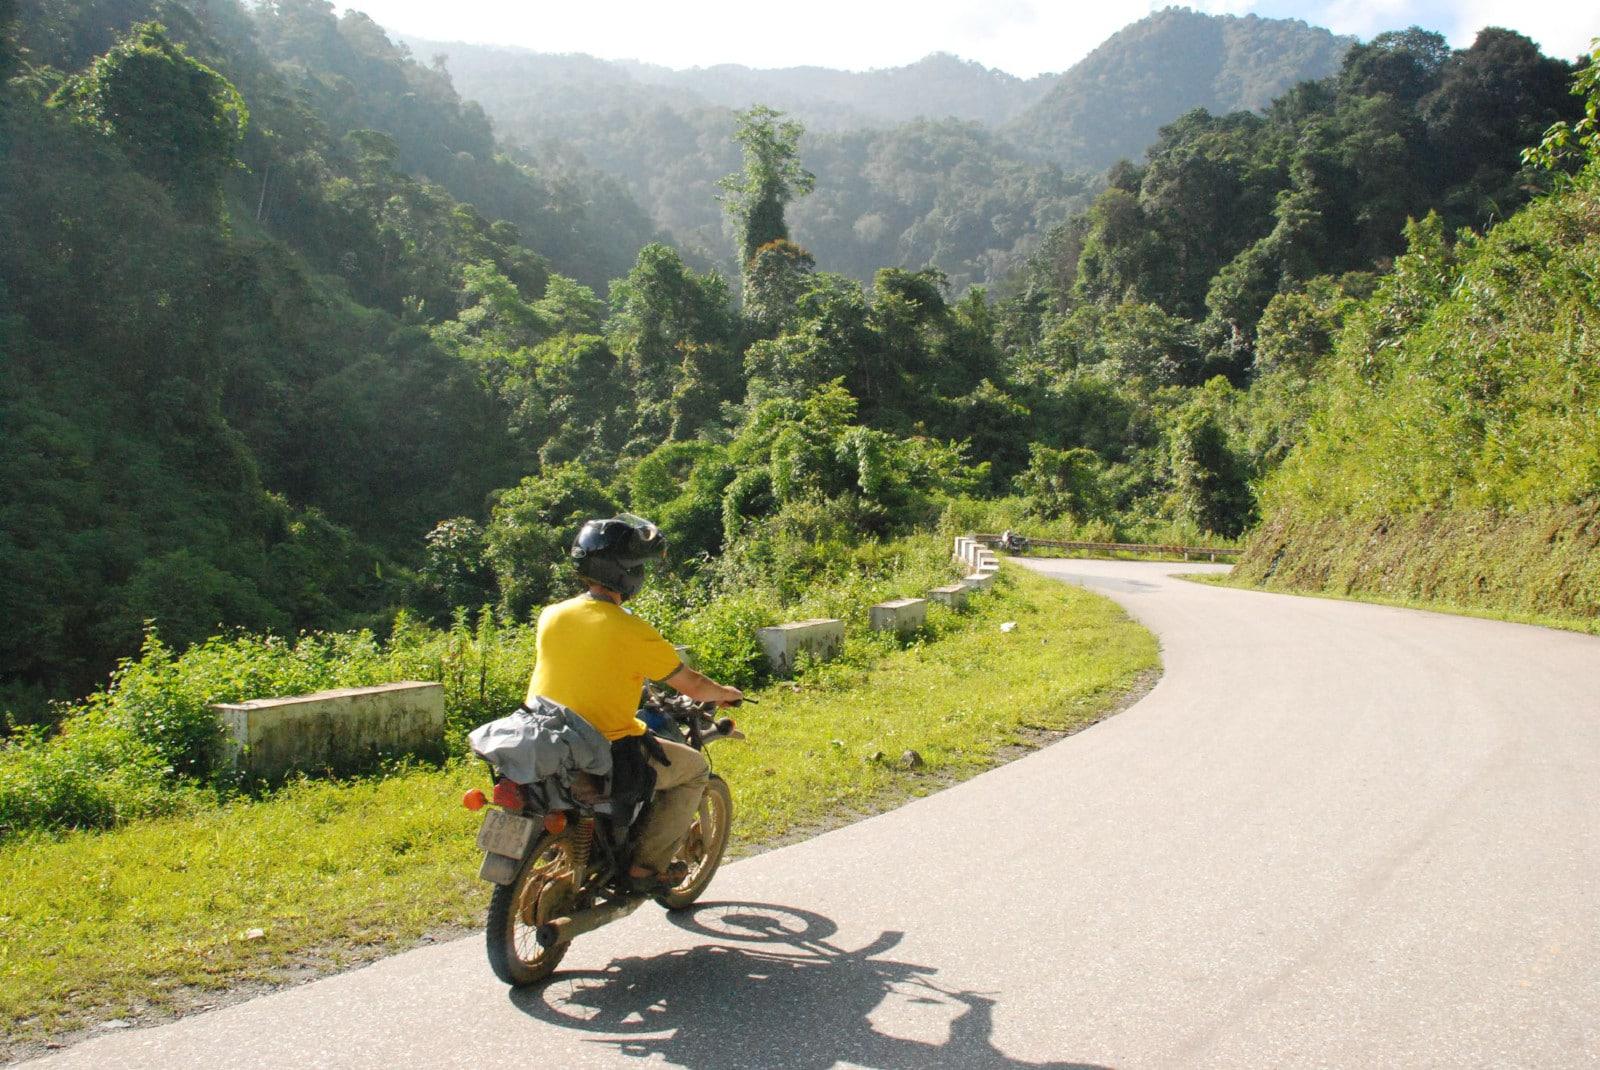 Image of a man in yellow on a minsk motorbike in Vietnam